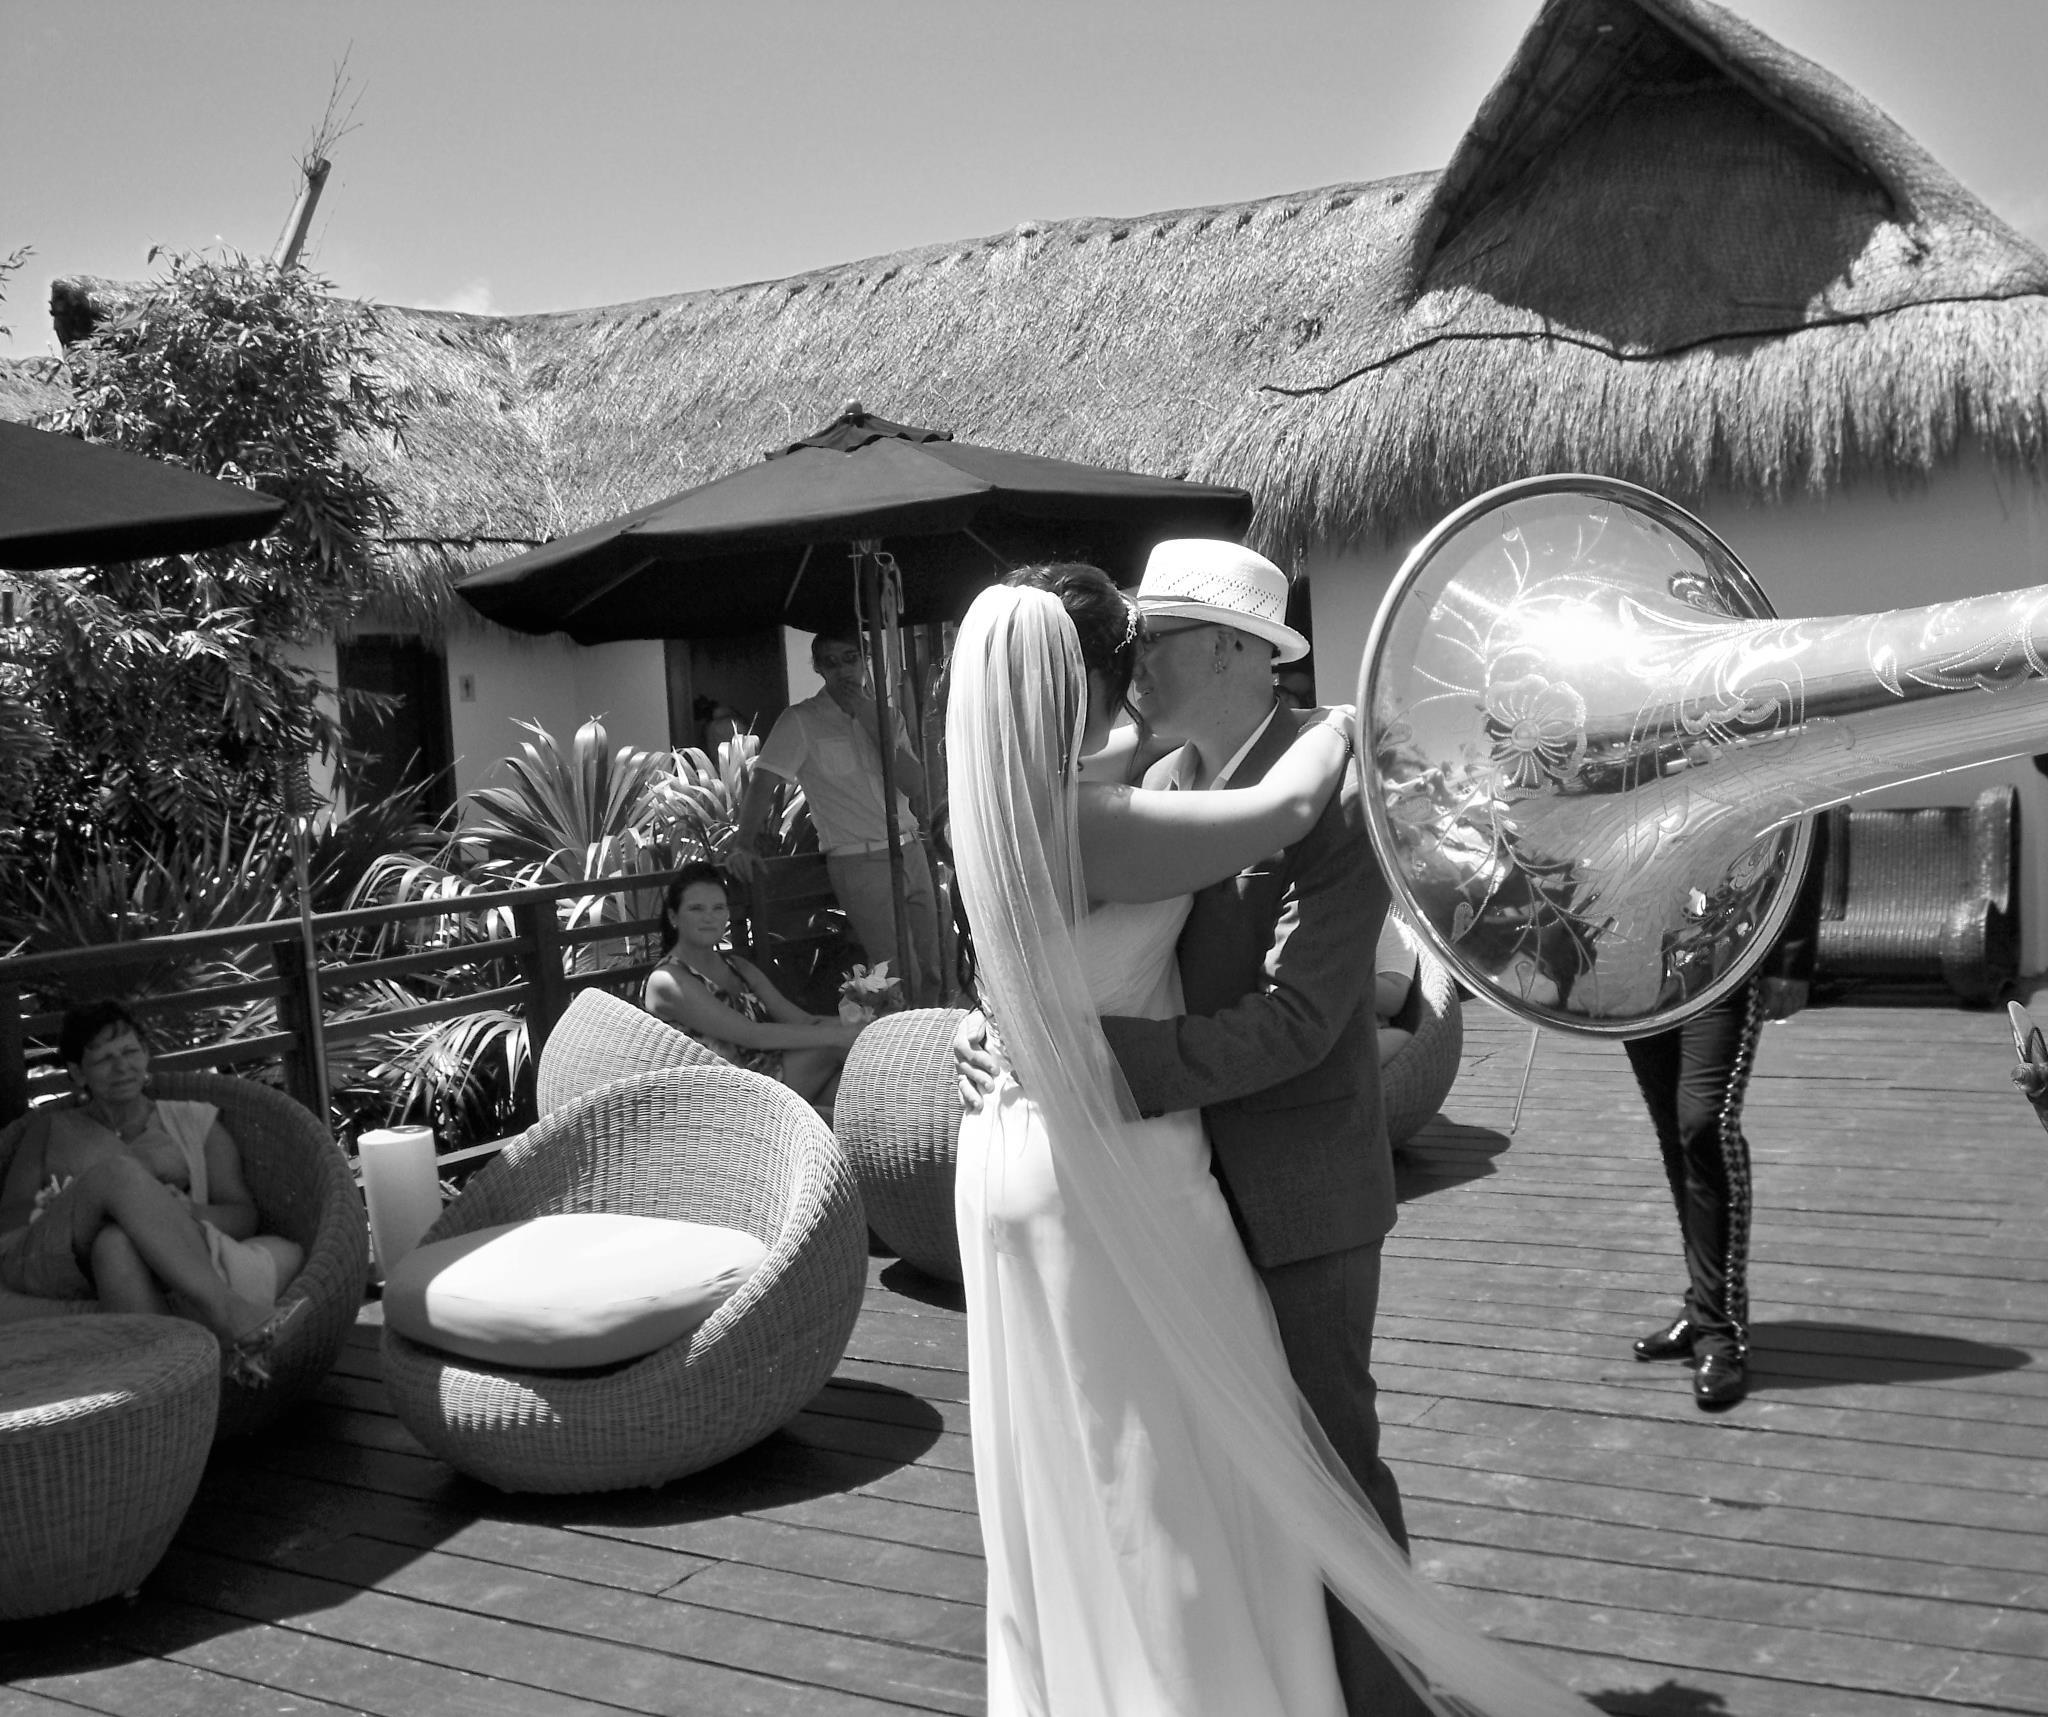 Mariachi-Tulum-horn.jpg